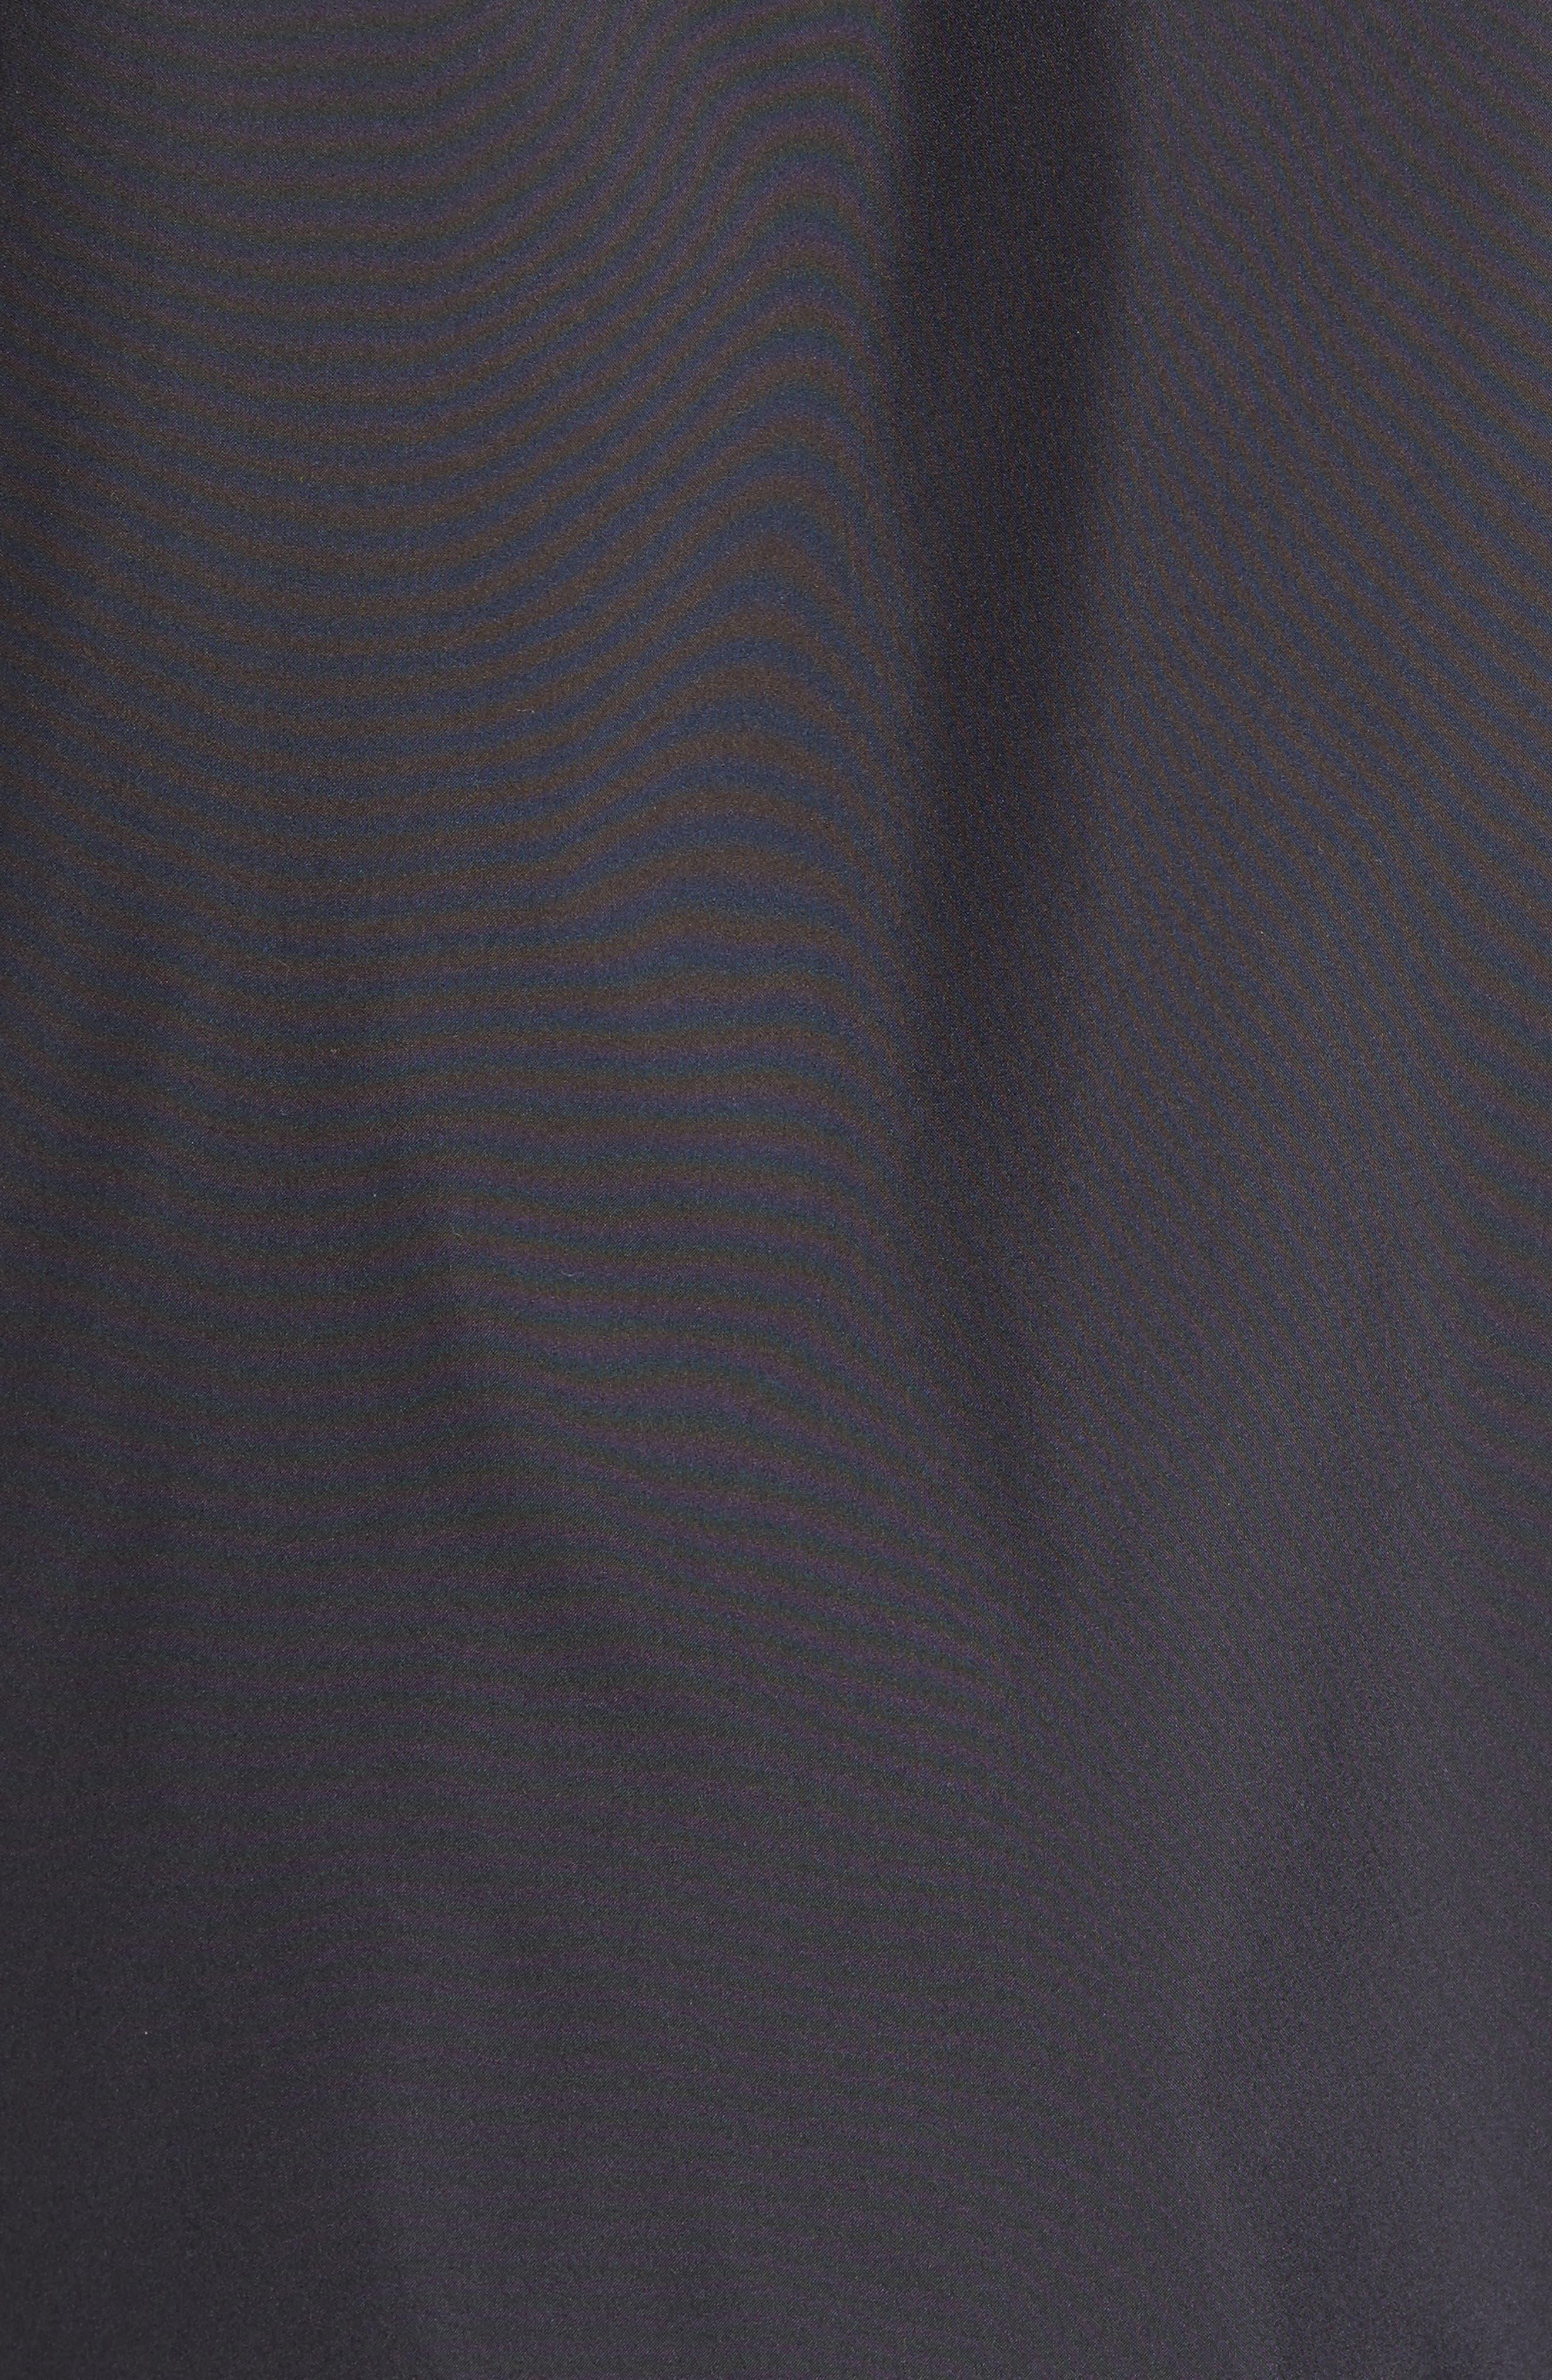 Crankset Regular Fit Jacket,                             Alternate thumbnail 7, color,                             BLACK